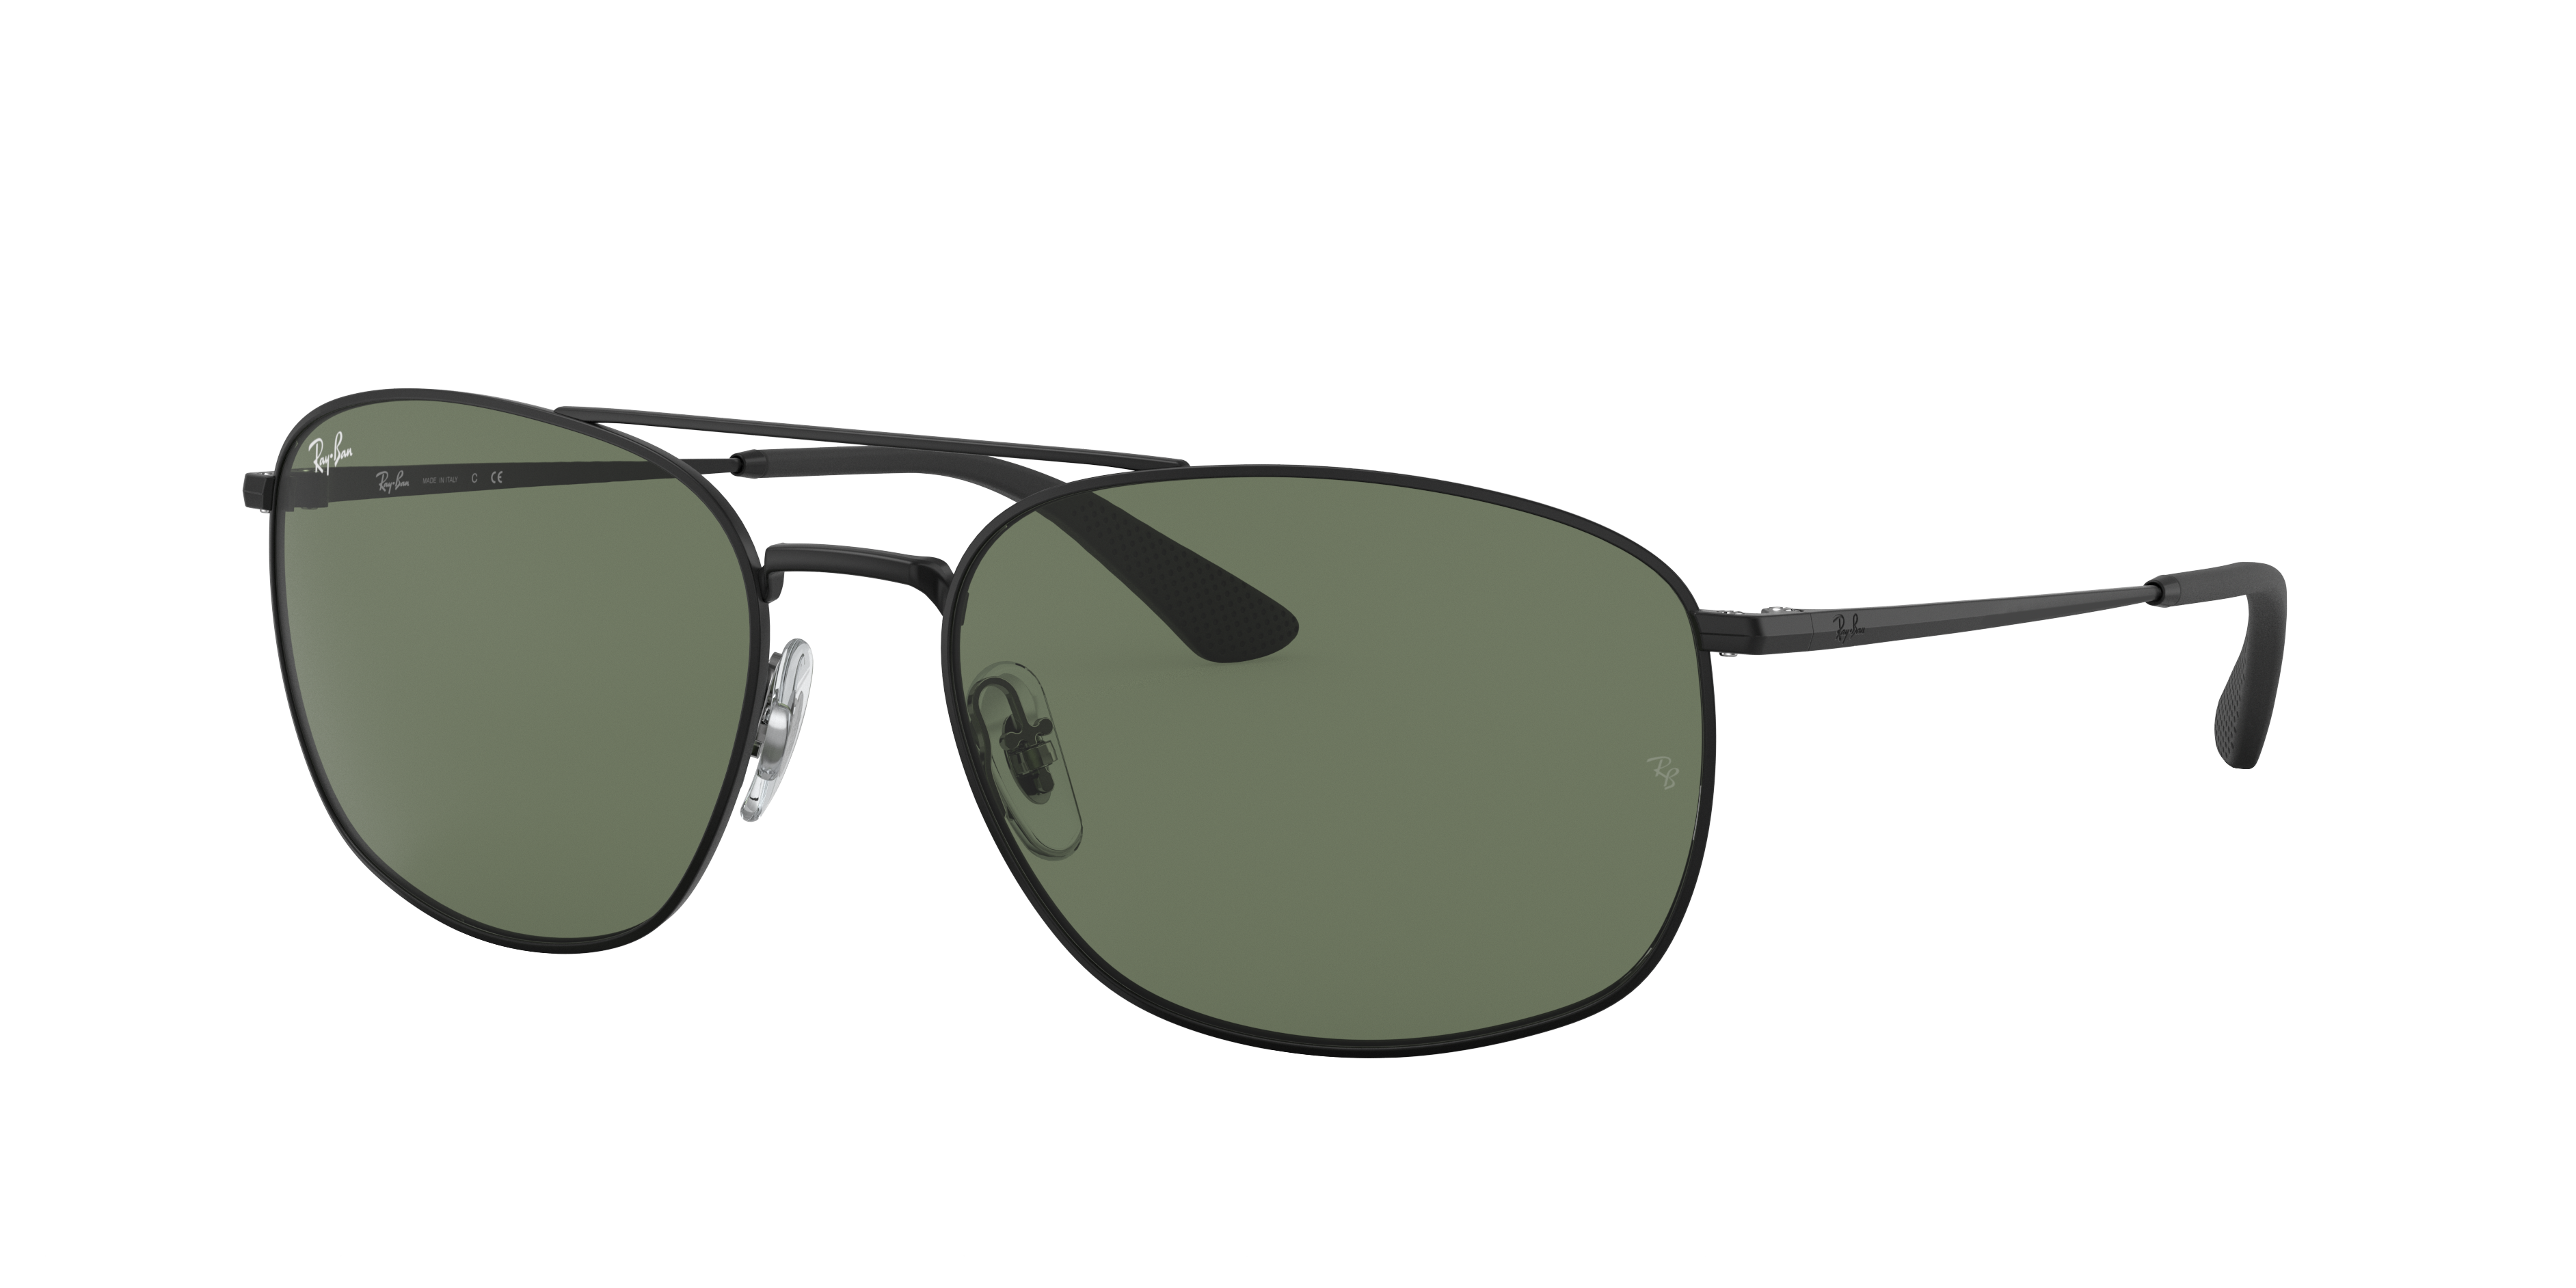 Ray-Ban Rb3654 Black, Green Lenses - RB3654